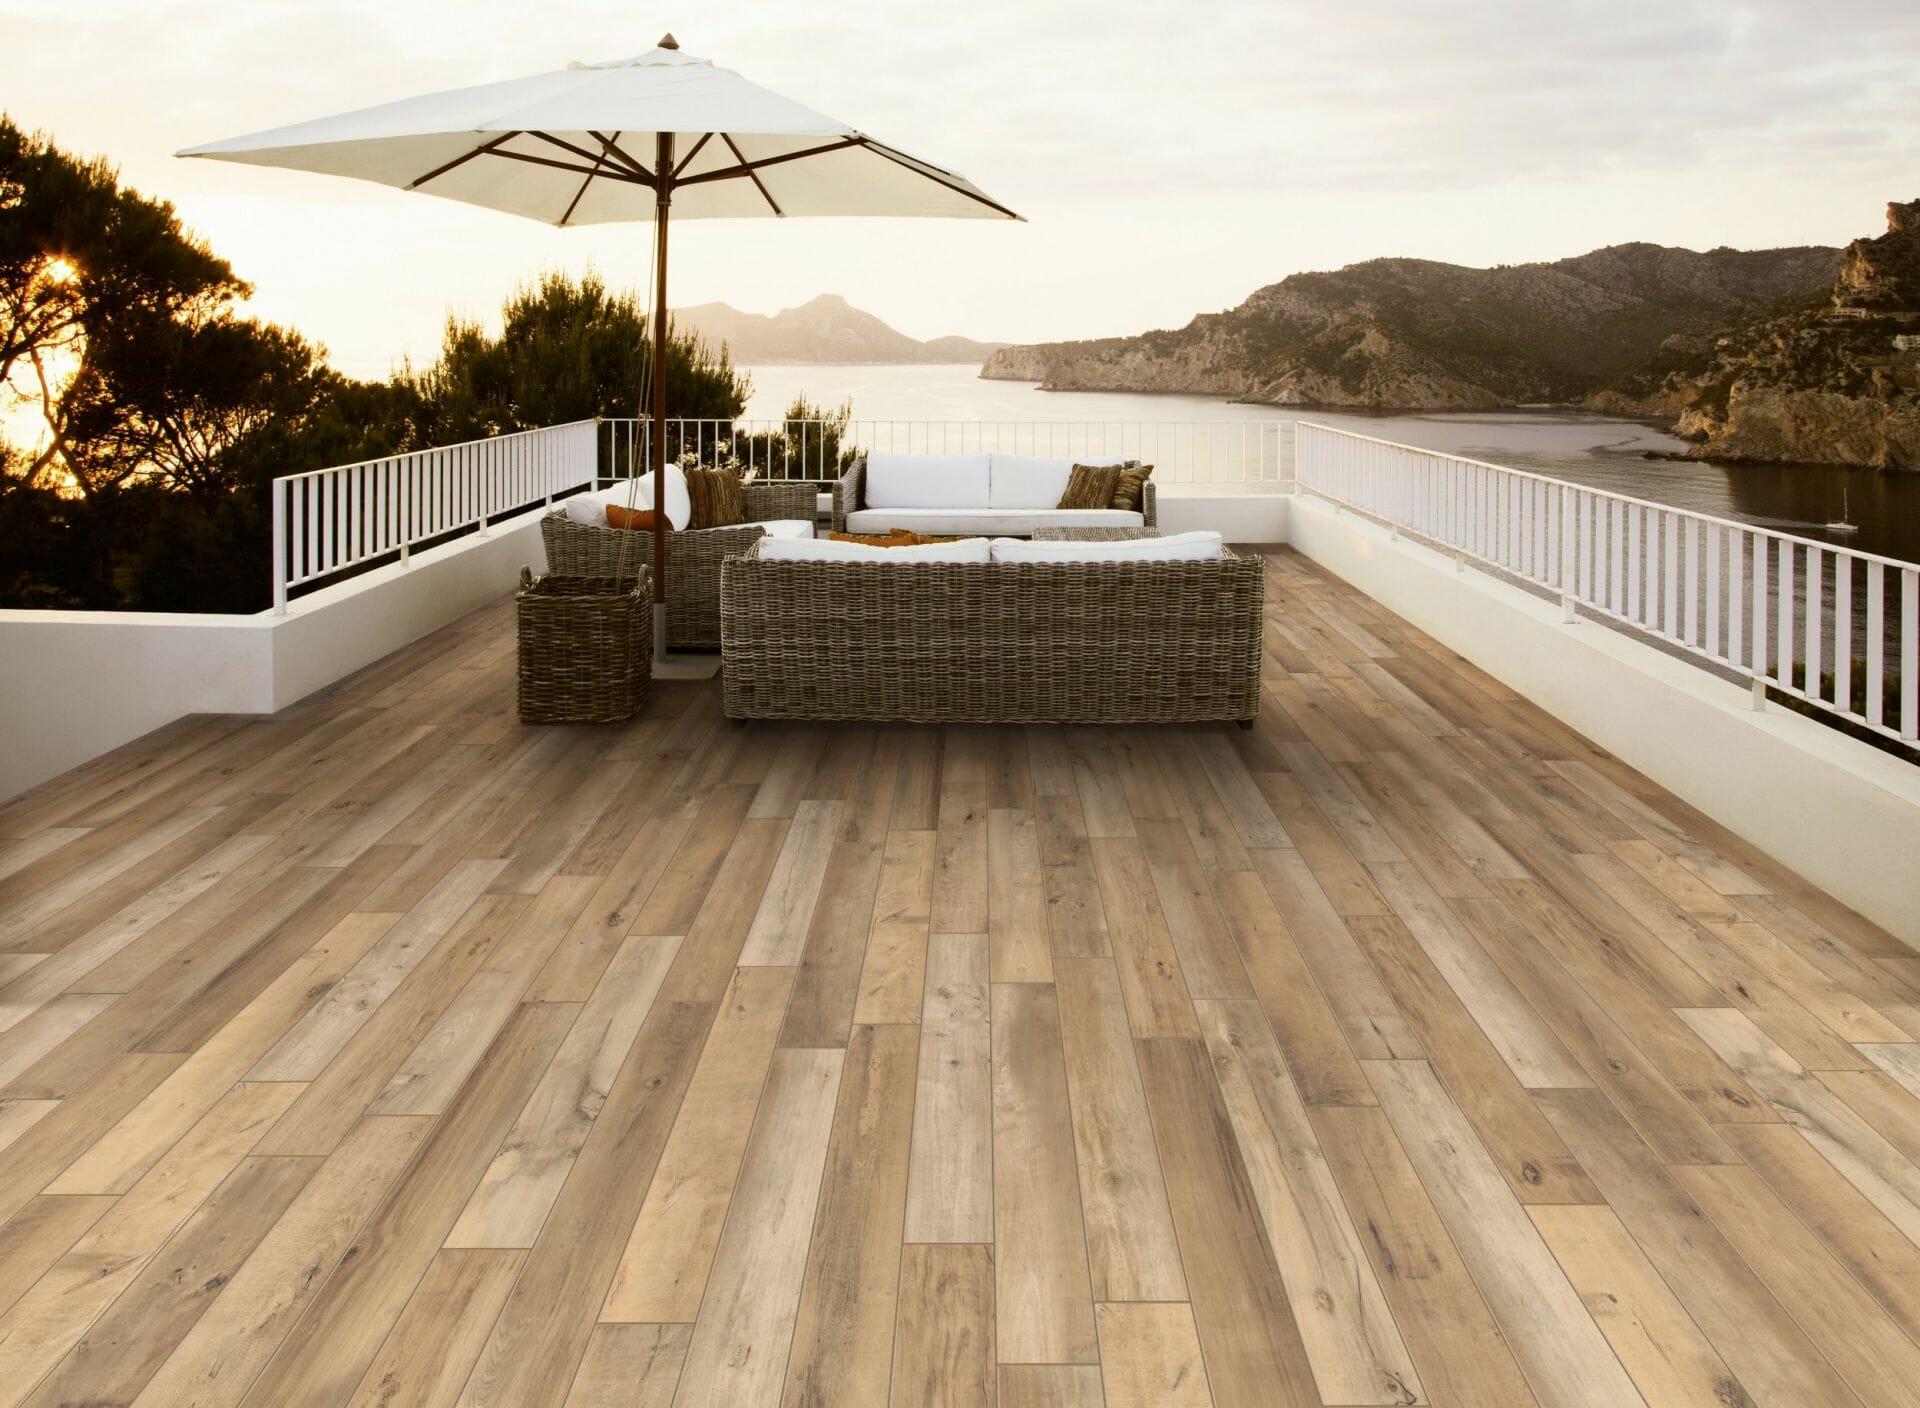 lifes-tiles-interior-design-blog-faking-nature-aspen